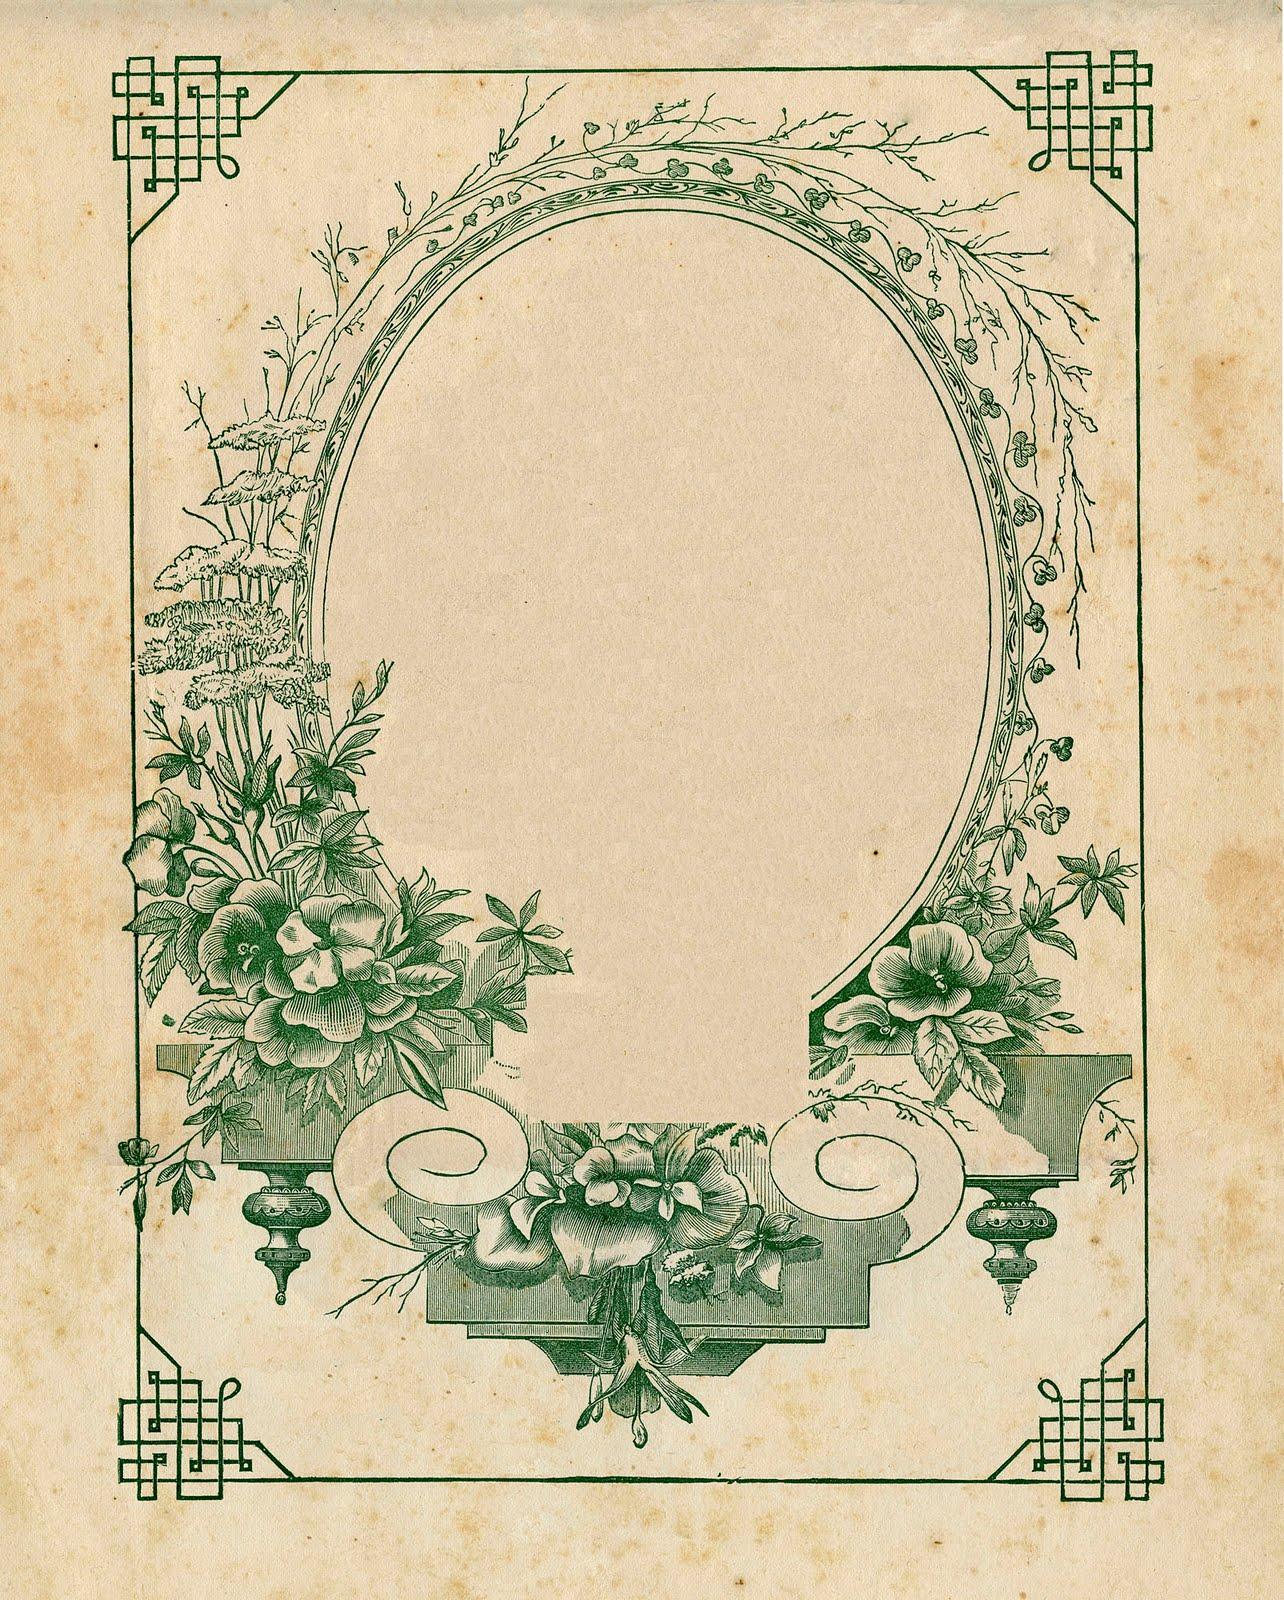 Sheet Music clipart old Amazing Music Art Ephemera Art